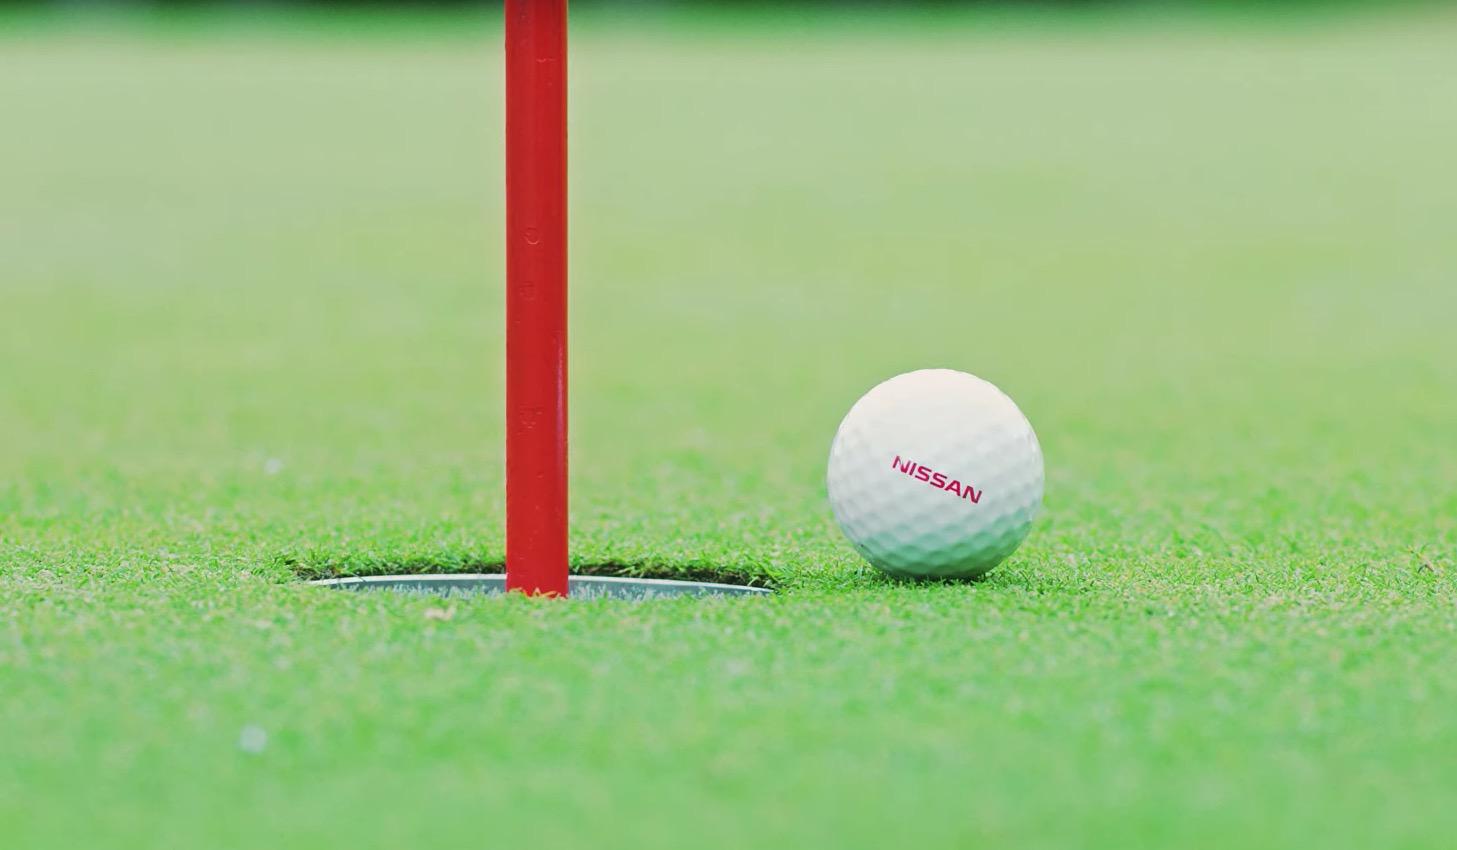 Nissan golf